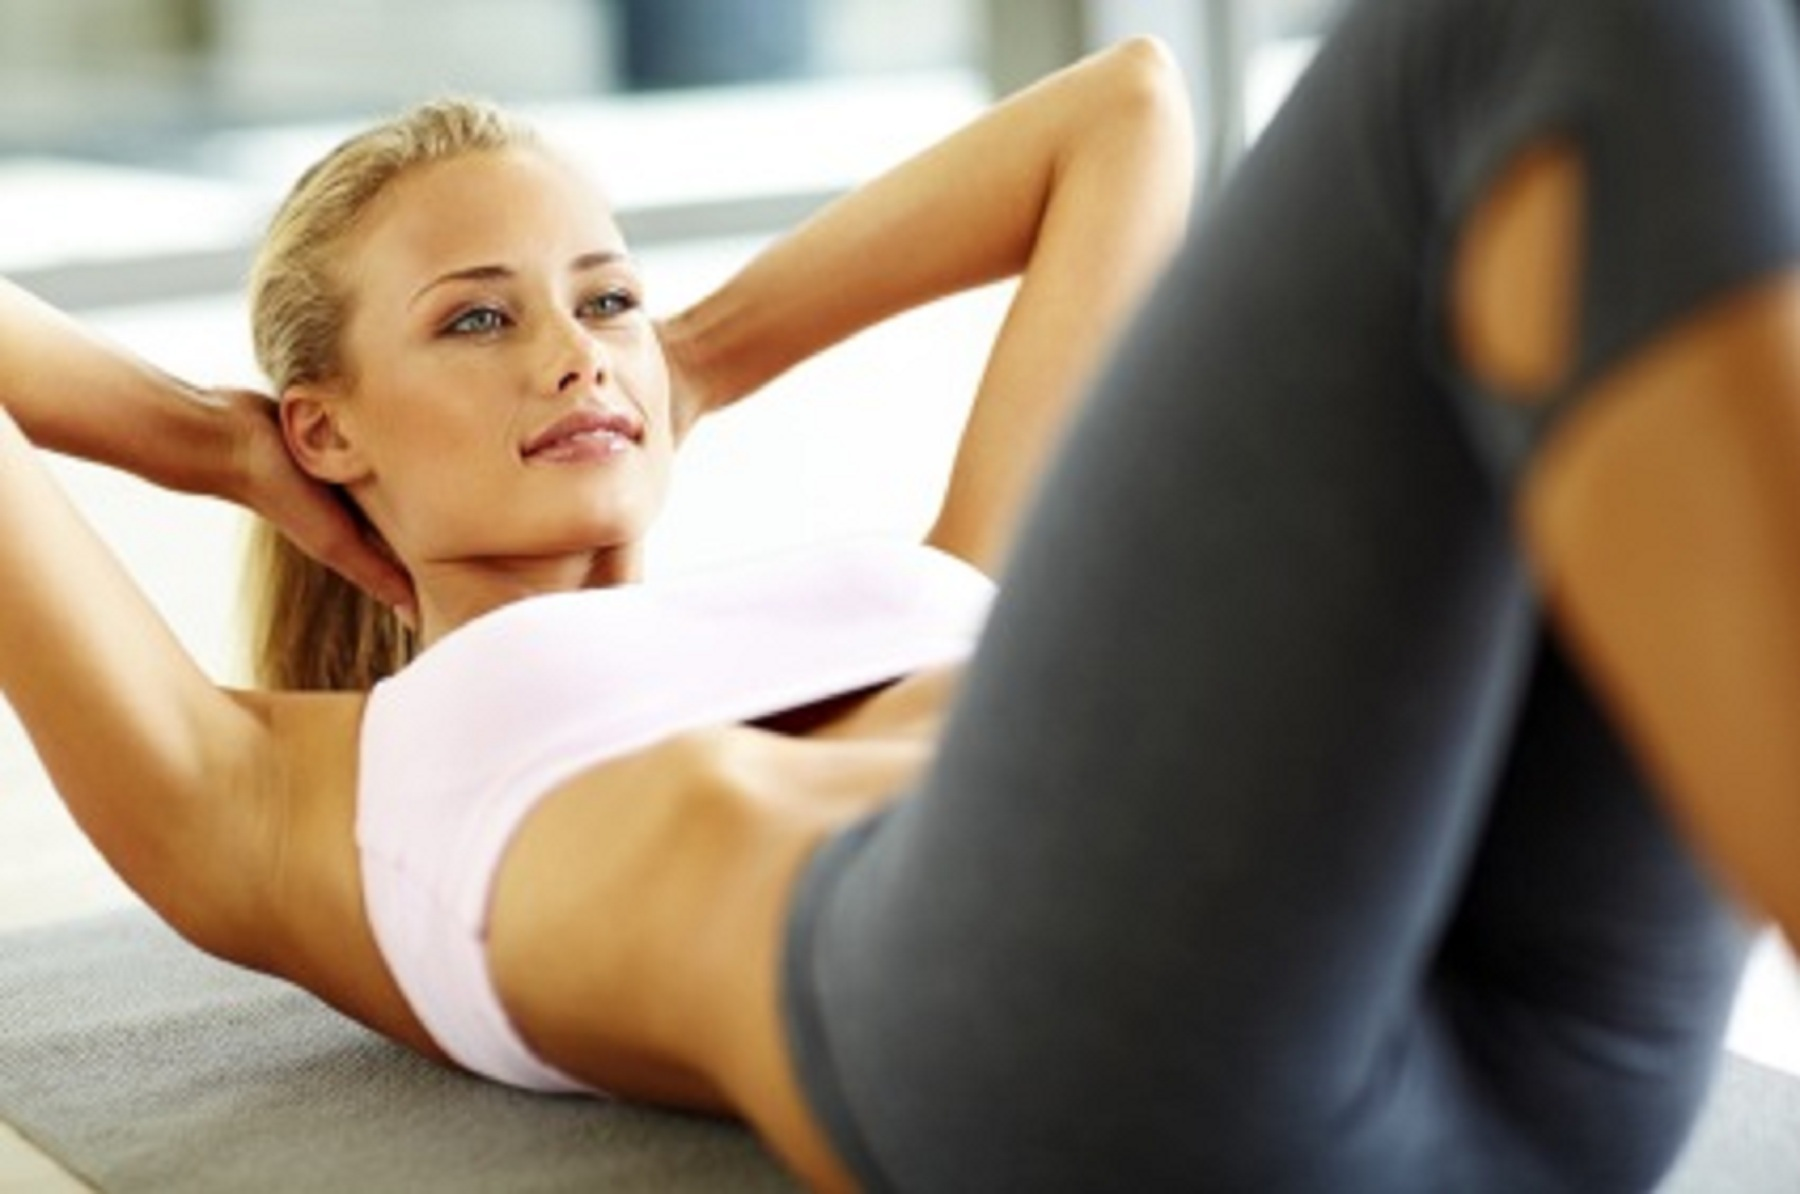 Fitness addominali